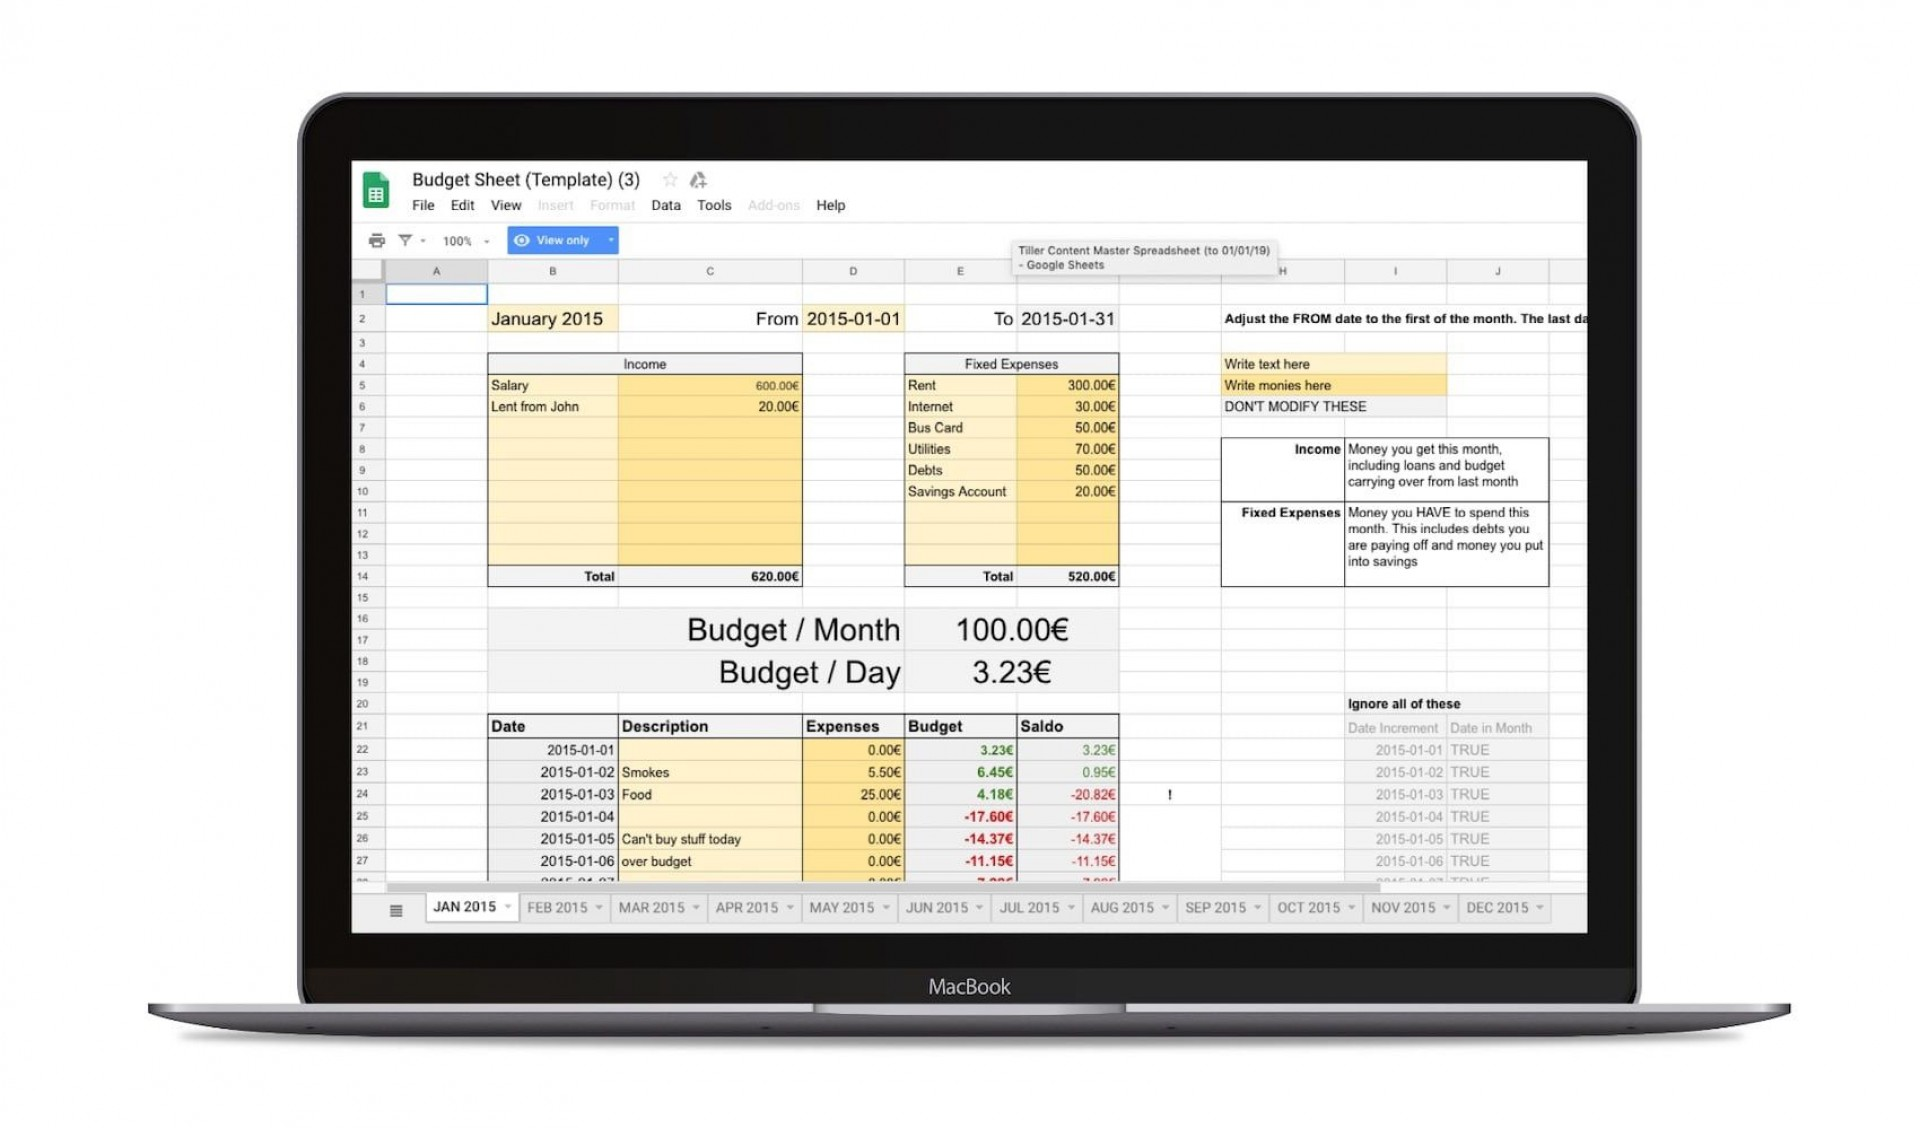 008 Best Personal Budget Sheet Template Uk Image  Spreadsheet1920